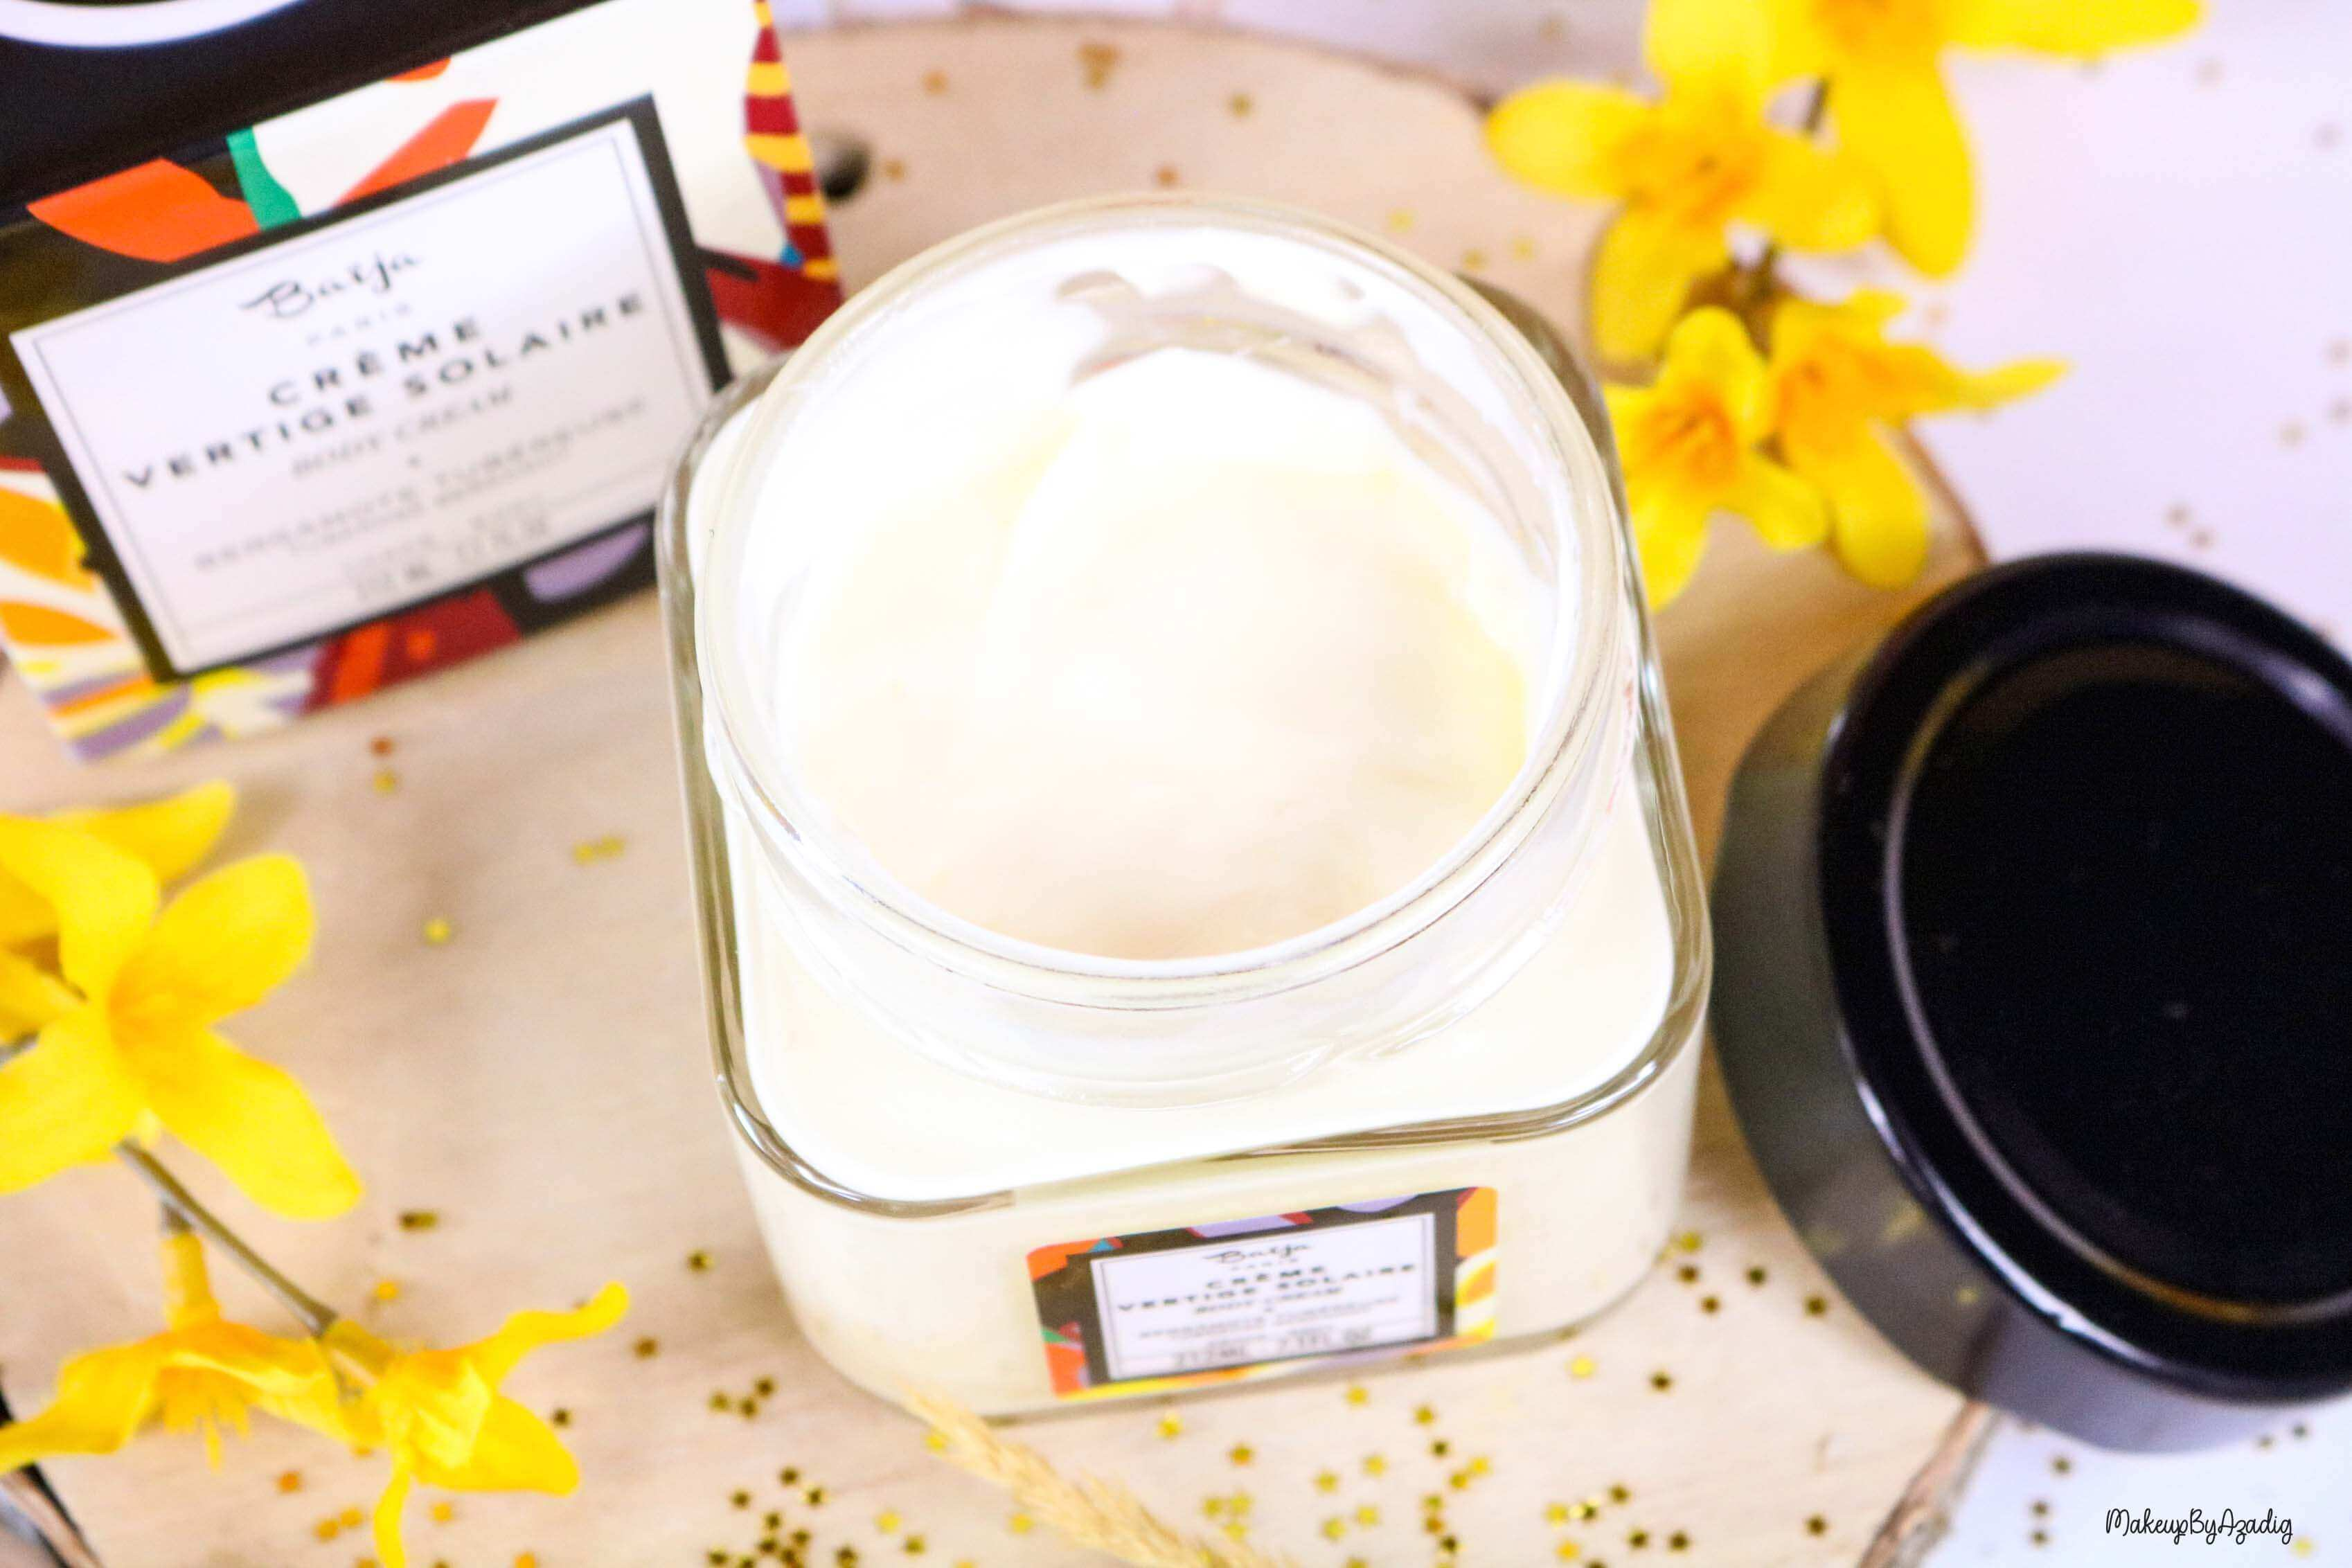 nouveaute-soin-baija-vertige-solaire-sephora-promo-code-gommage-creme-corps-brume-avis-prix-makeupbyazadig-qualite-cream